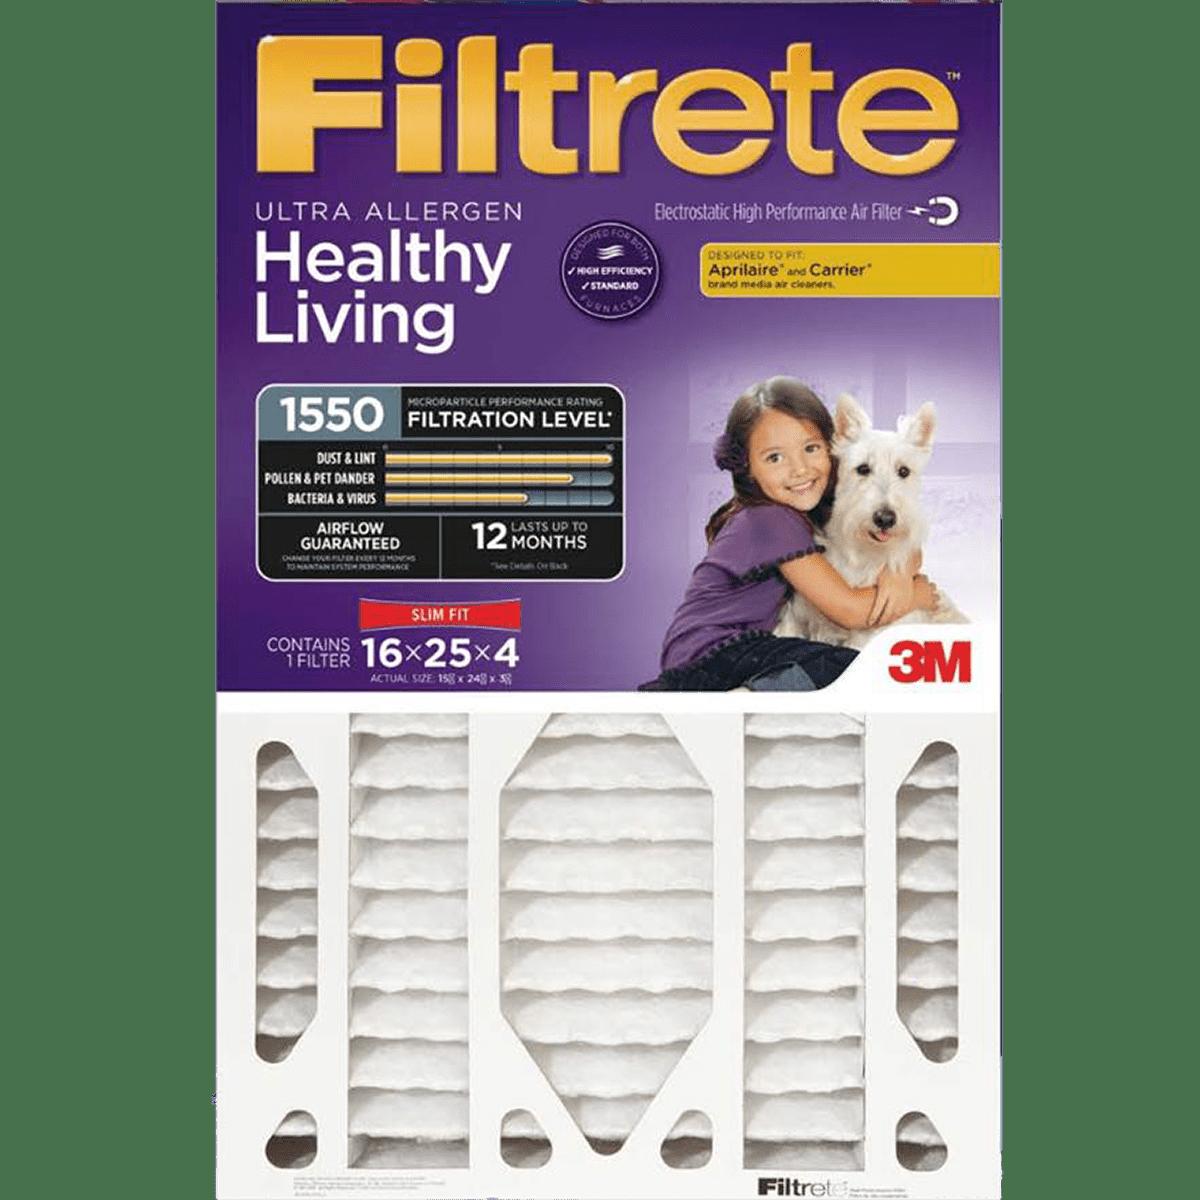 3m Filtrete Healthy Living 1550 Mpr 4-inch Ultra Allergen Reduction Slim-fit Filters